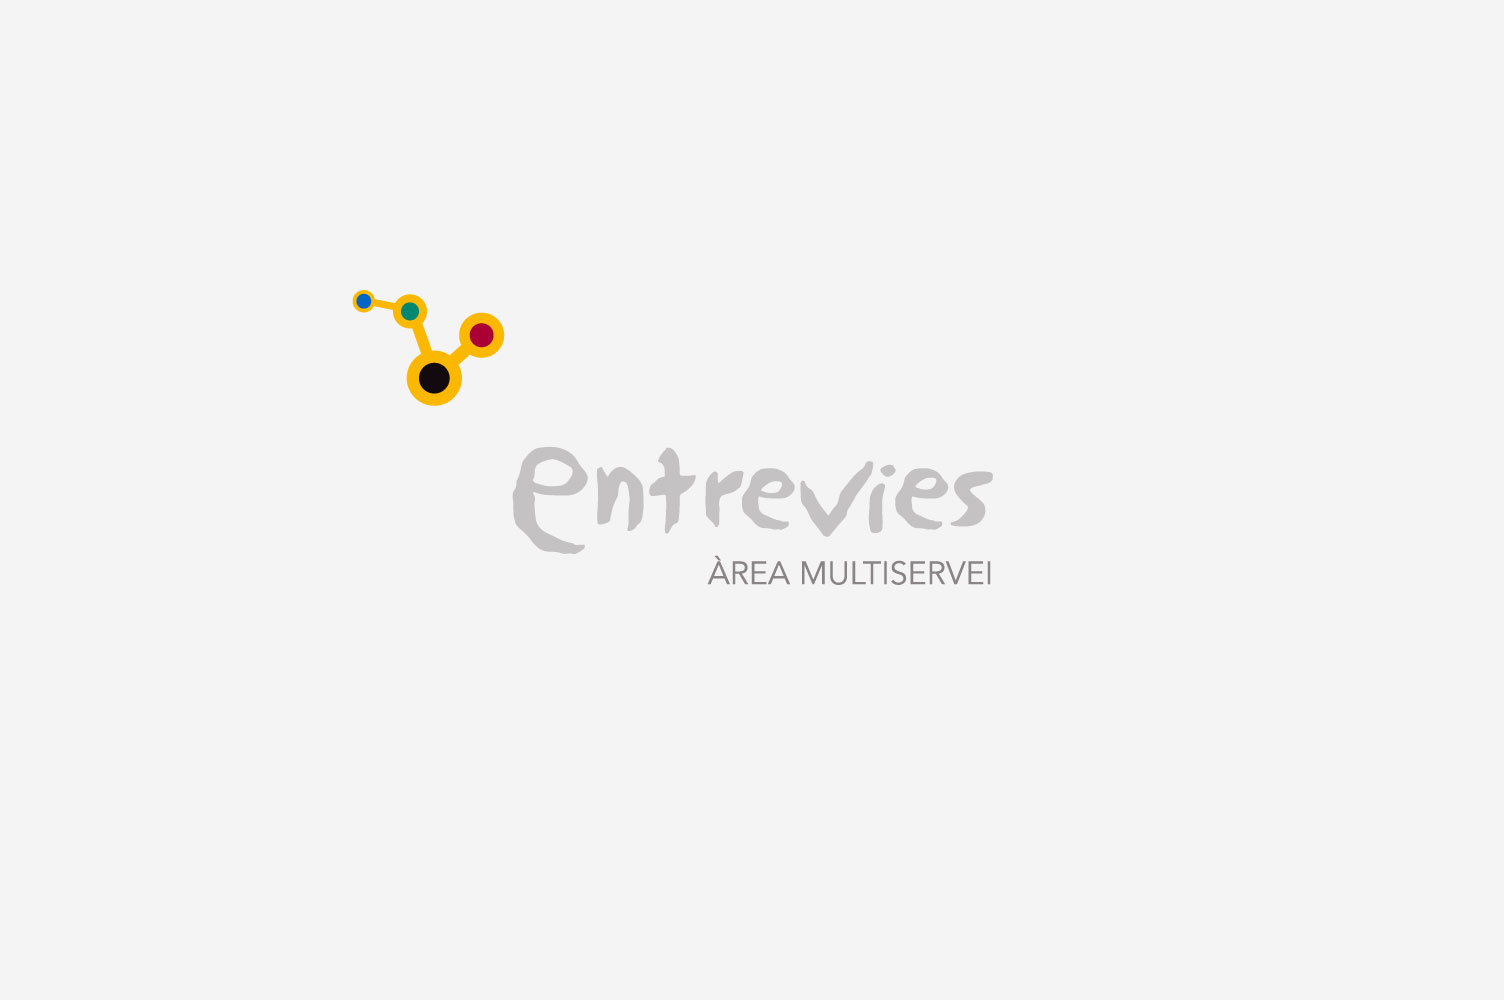 Imagen global diseño de marca entrevies v1